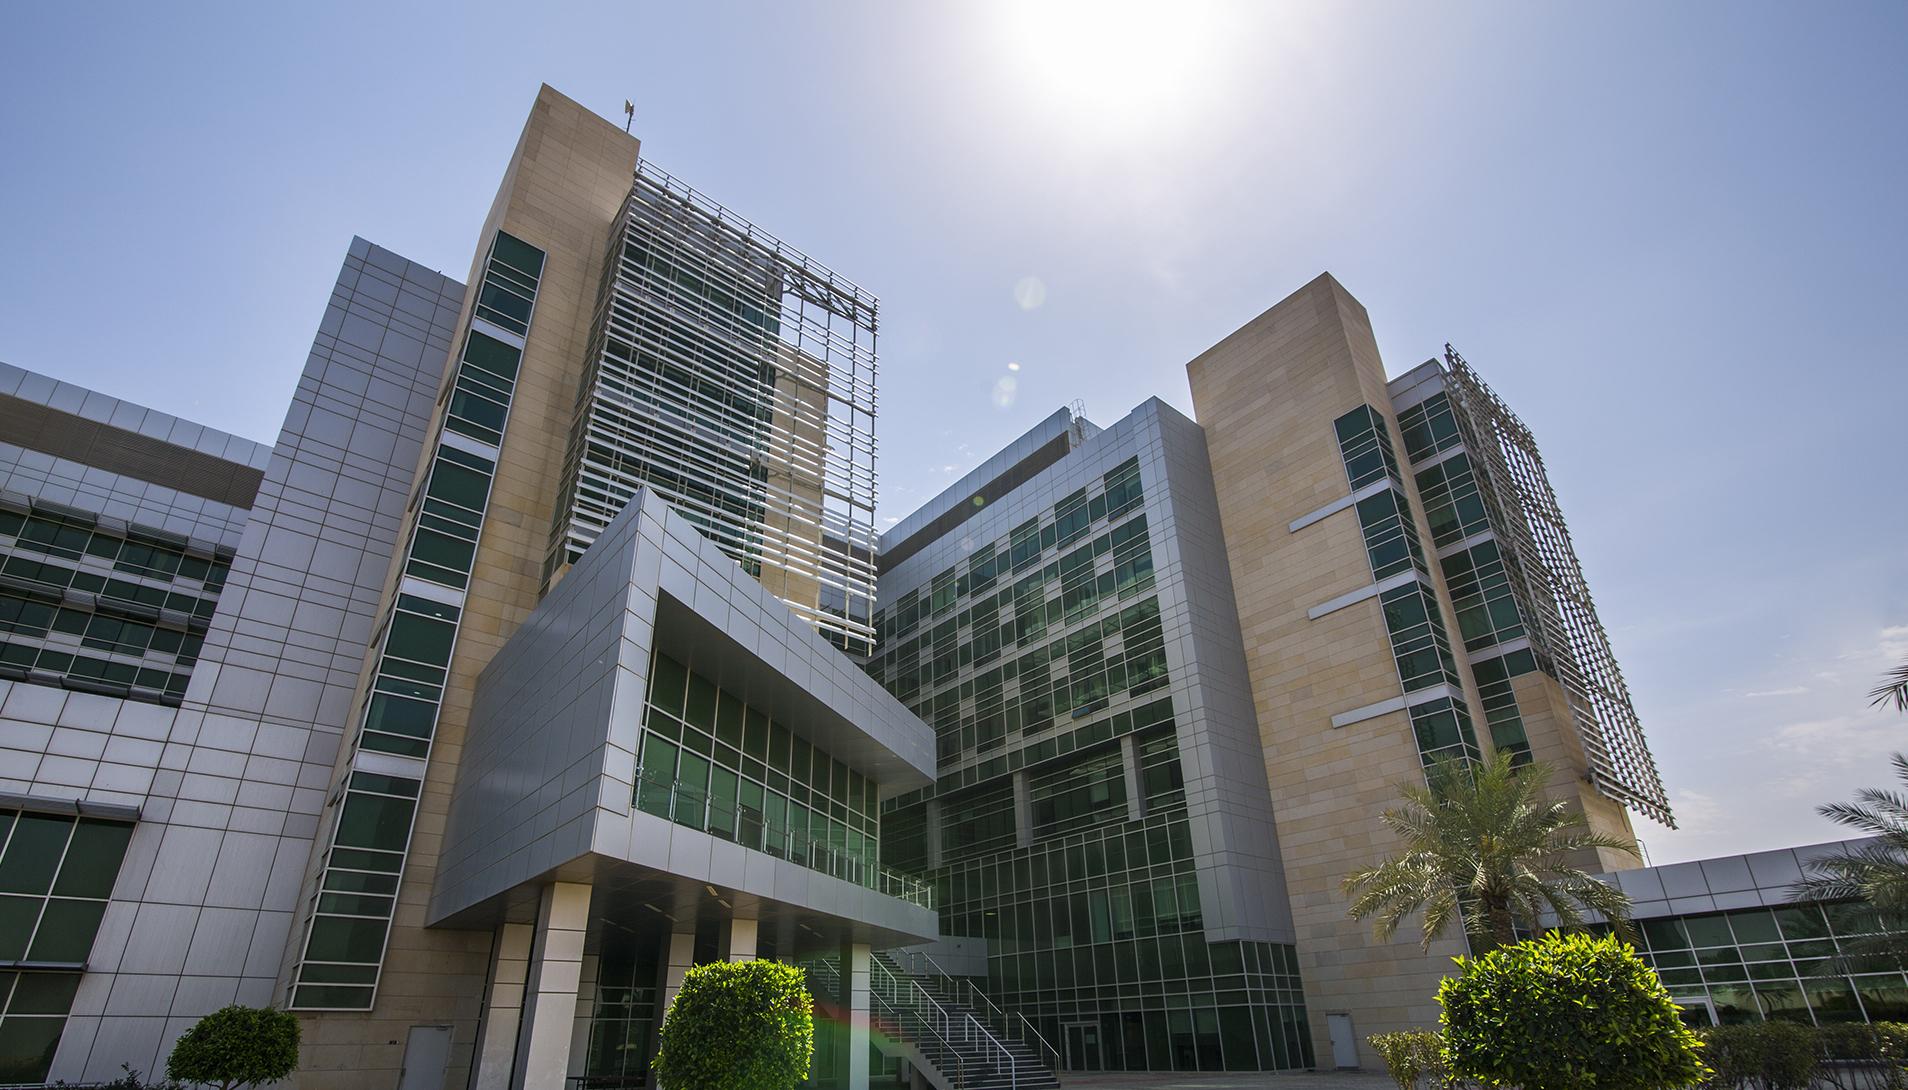 Sheik Khalifa Specialty Hospital Uae Needs Nurses Up To 180 500 Minimum Total Salary Infonurses Com